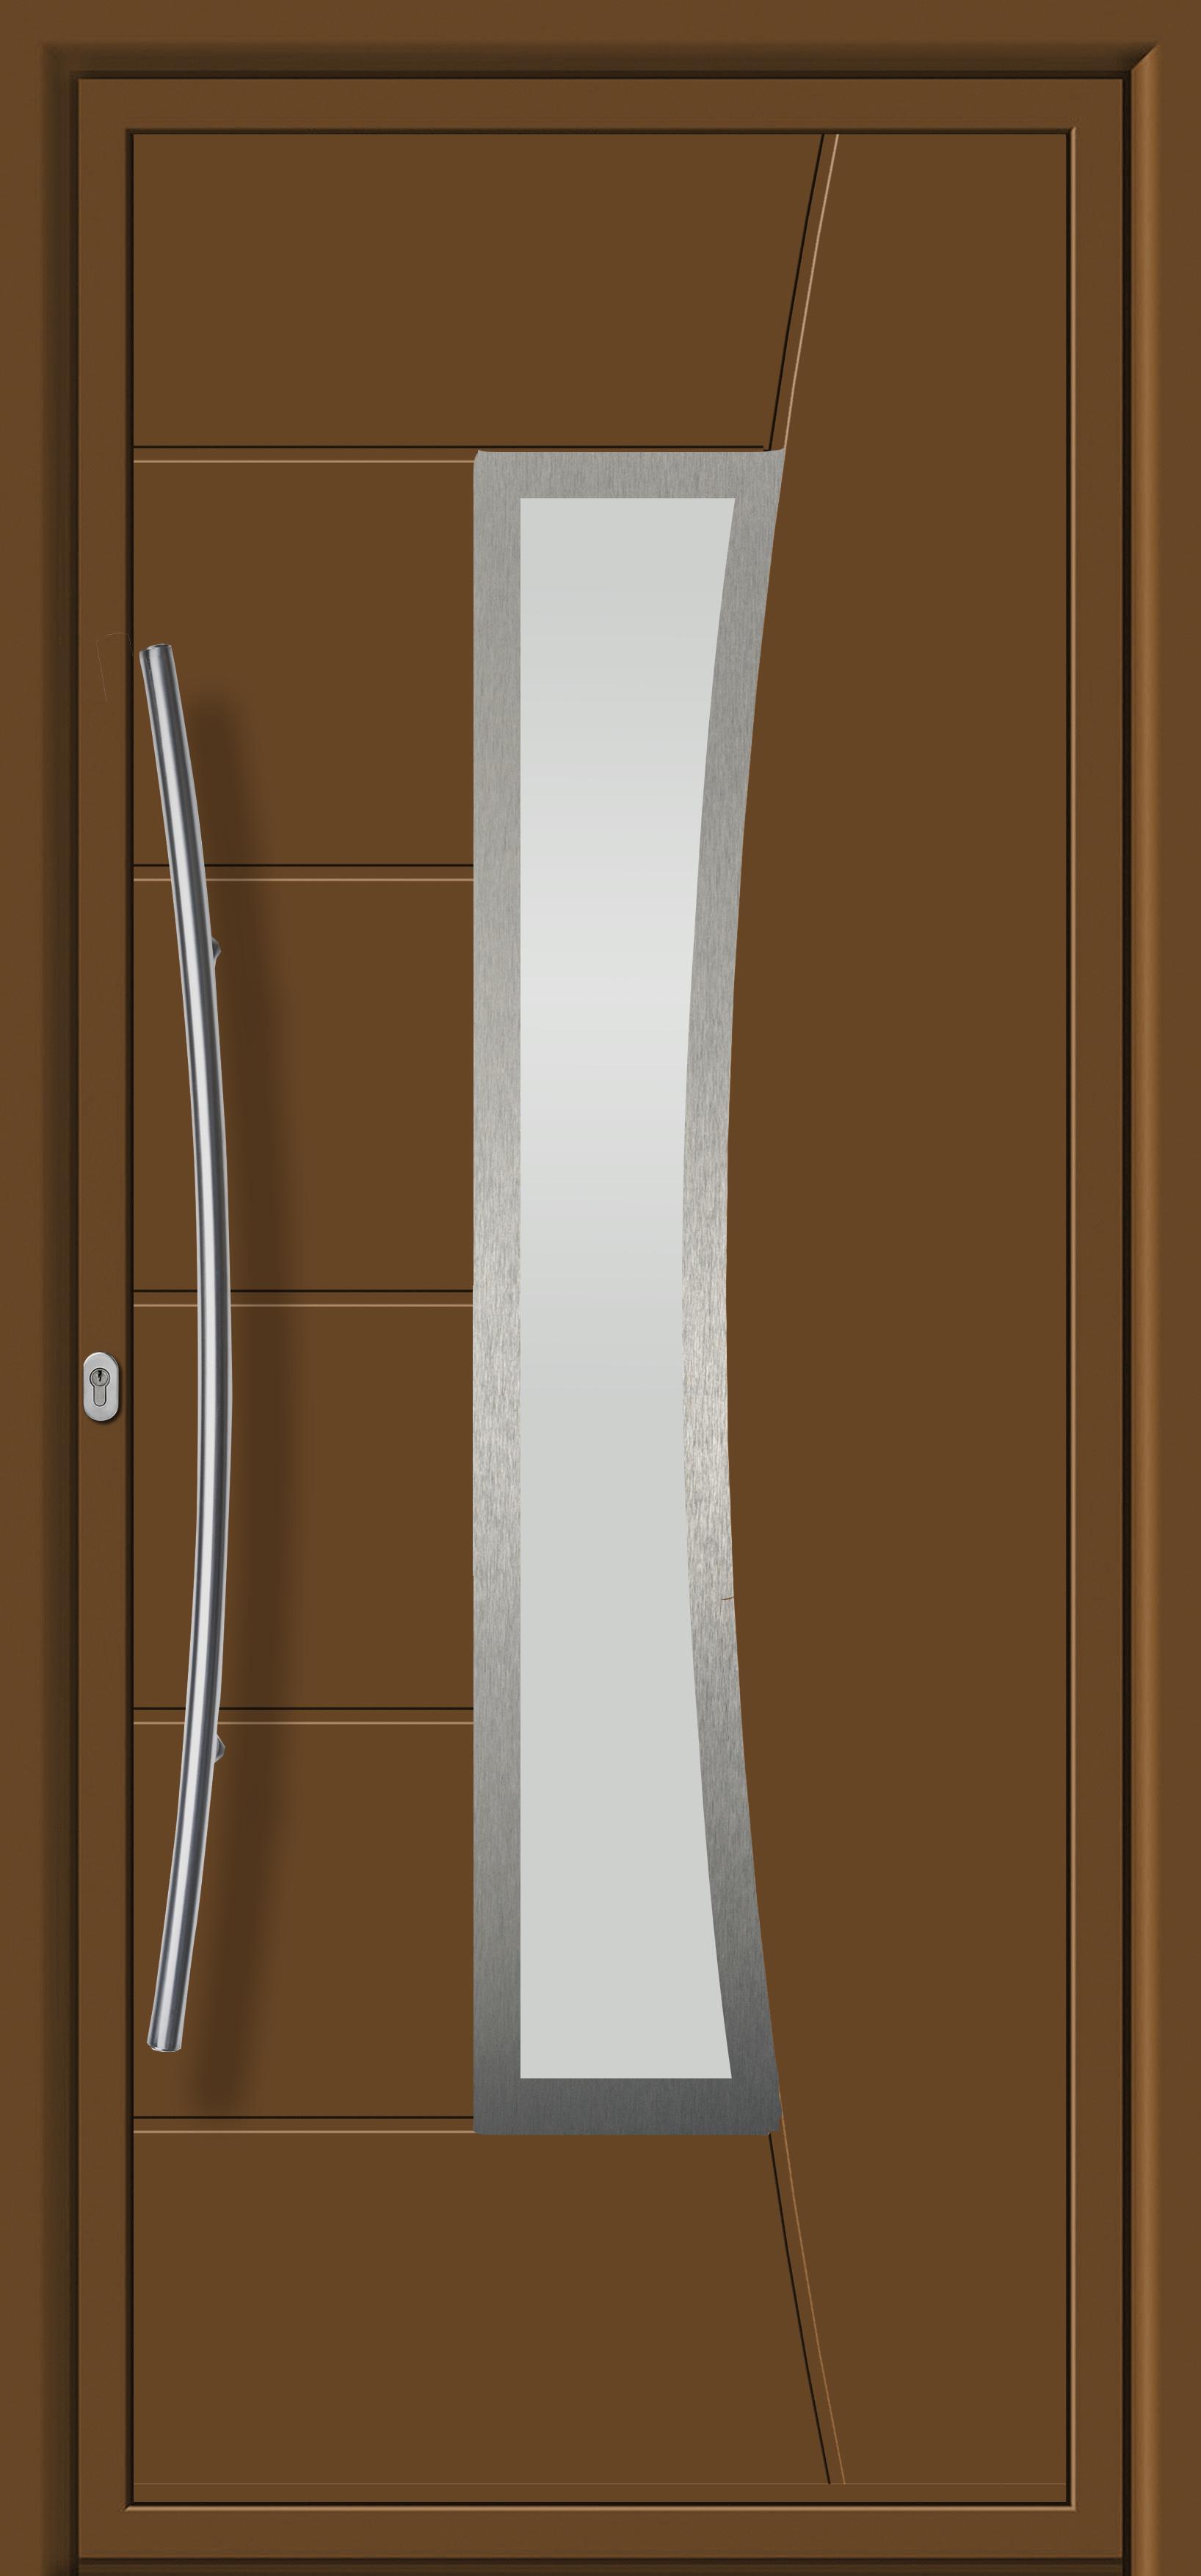 Fnix-1-vidrio-mate